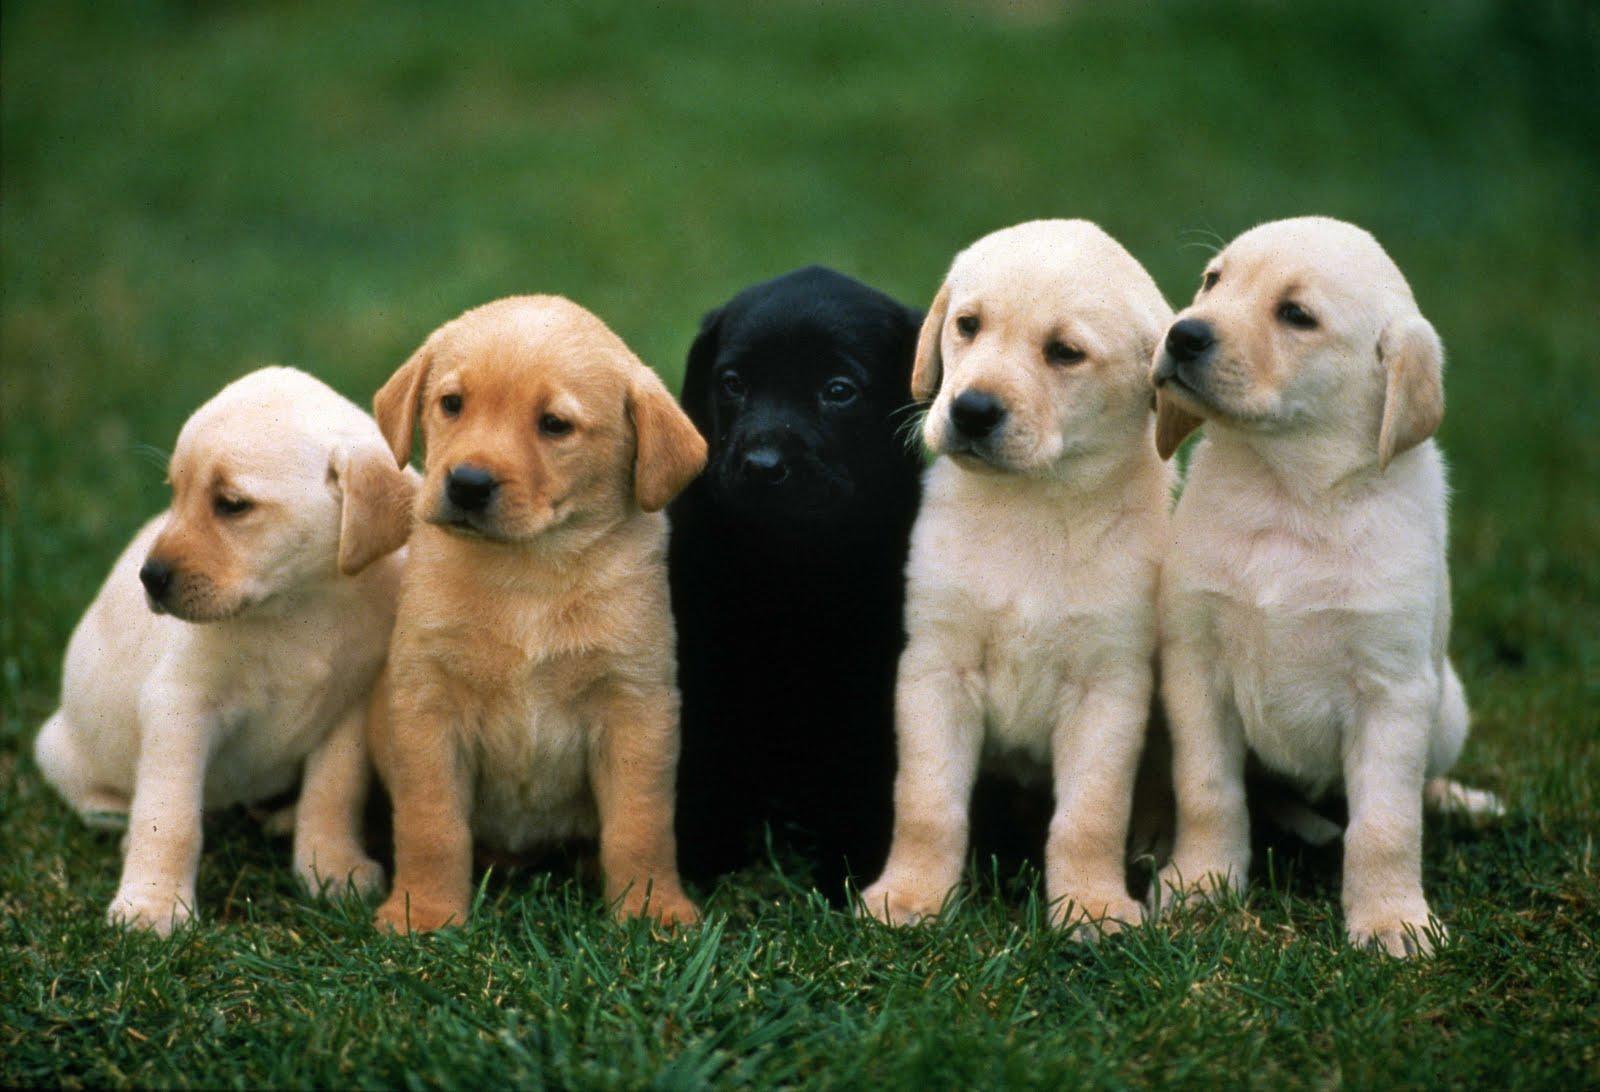 cute-dog-picture-ari-best-photo-stock-aeg